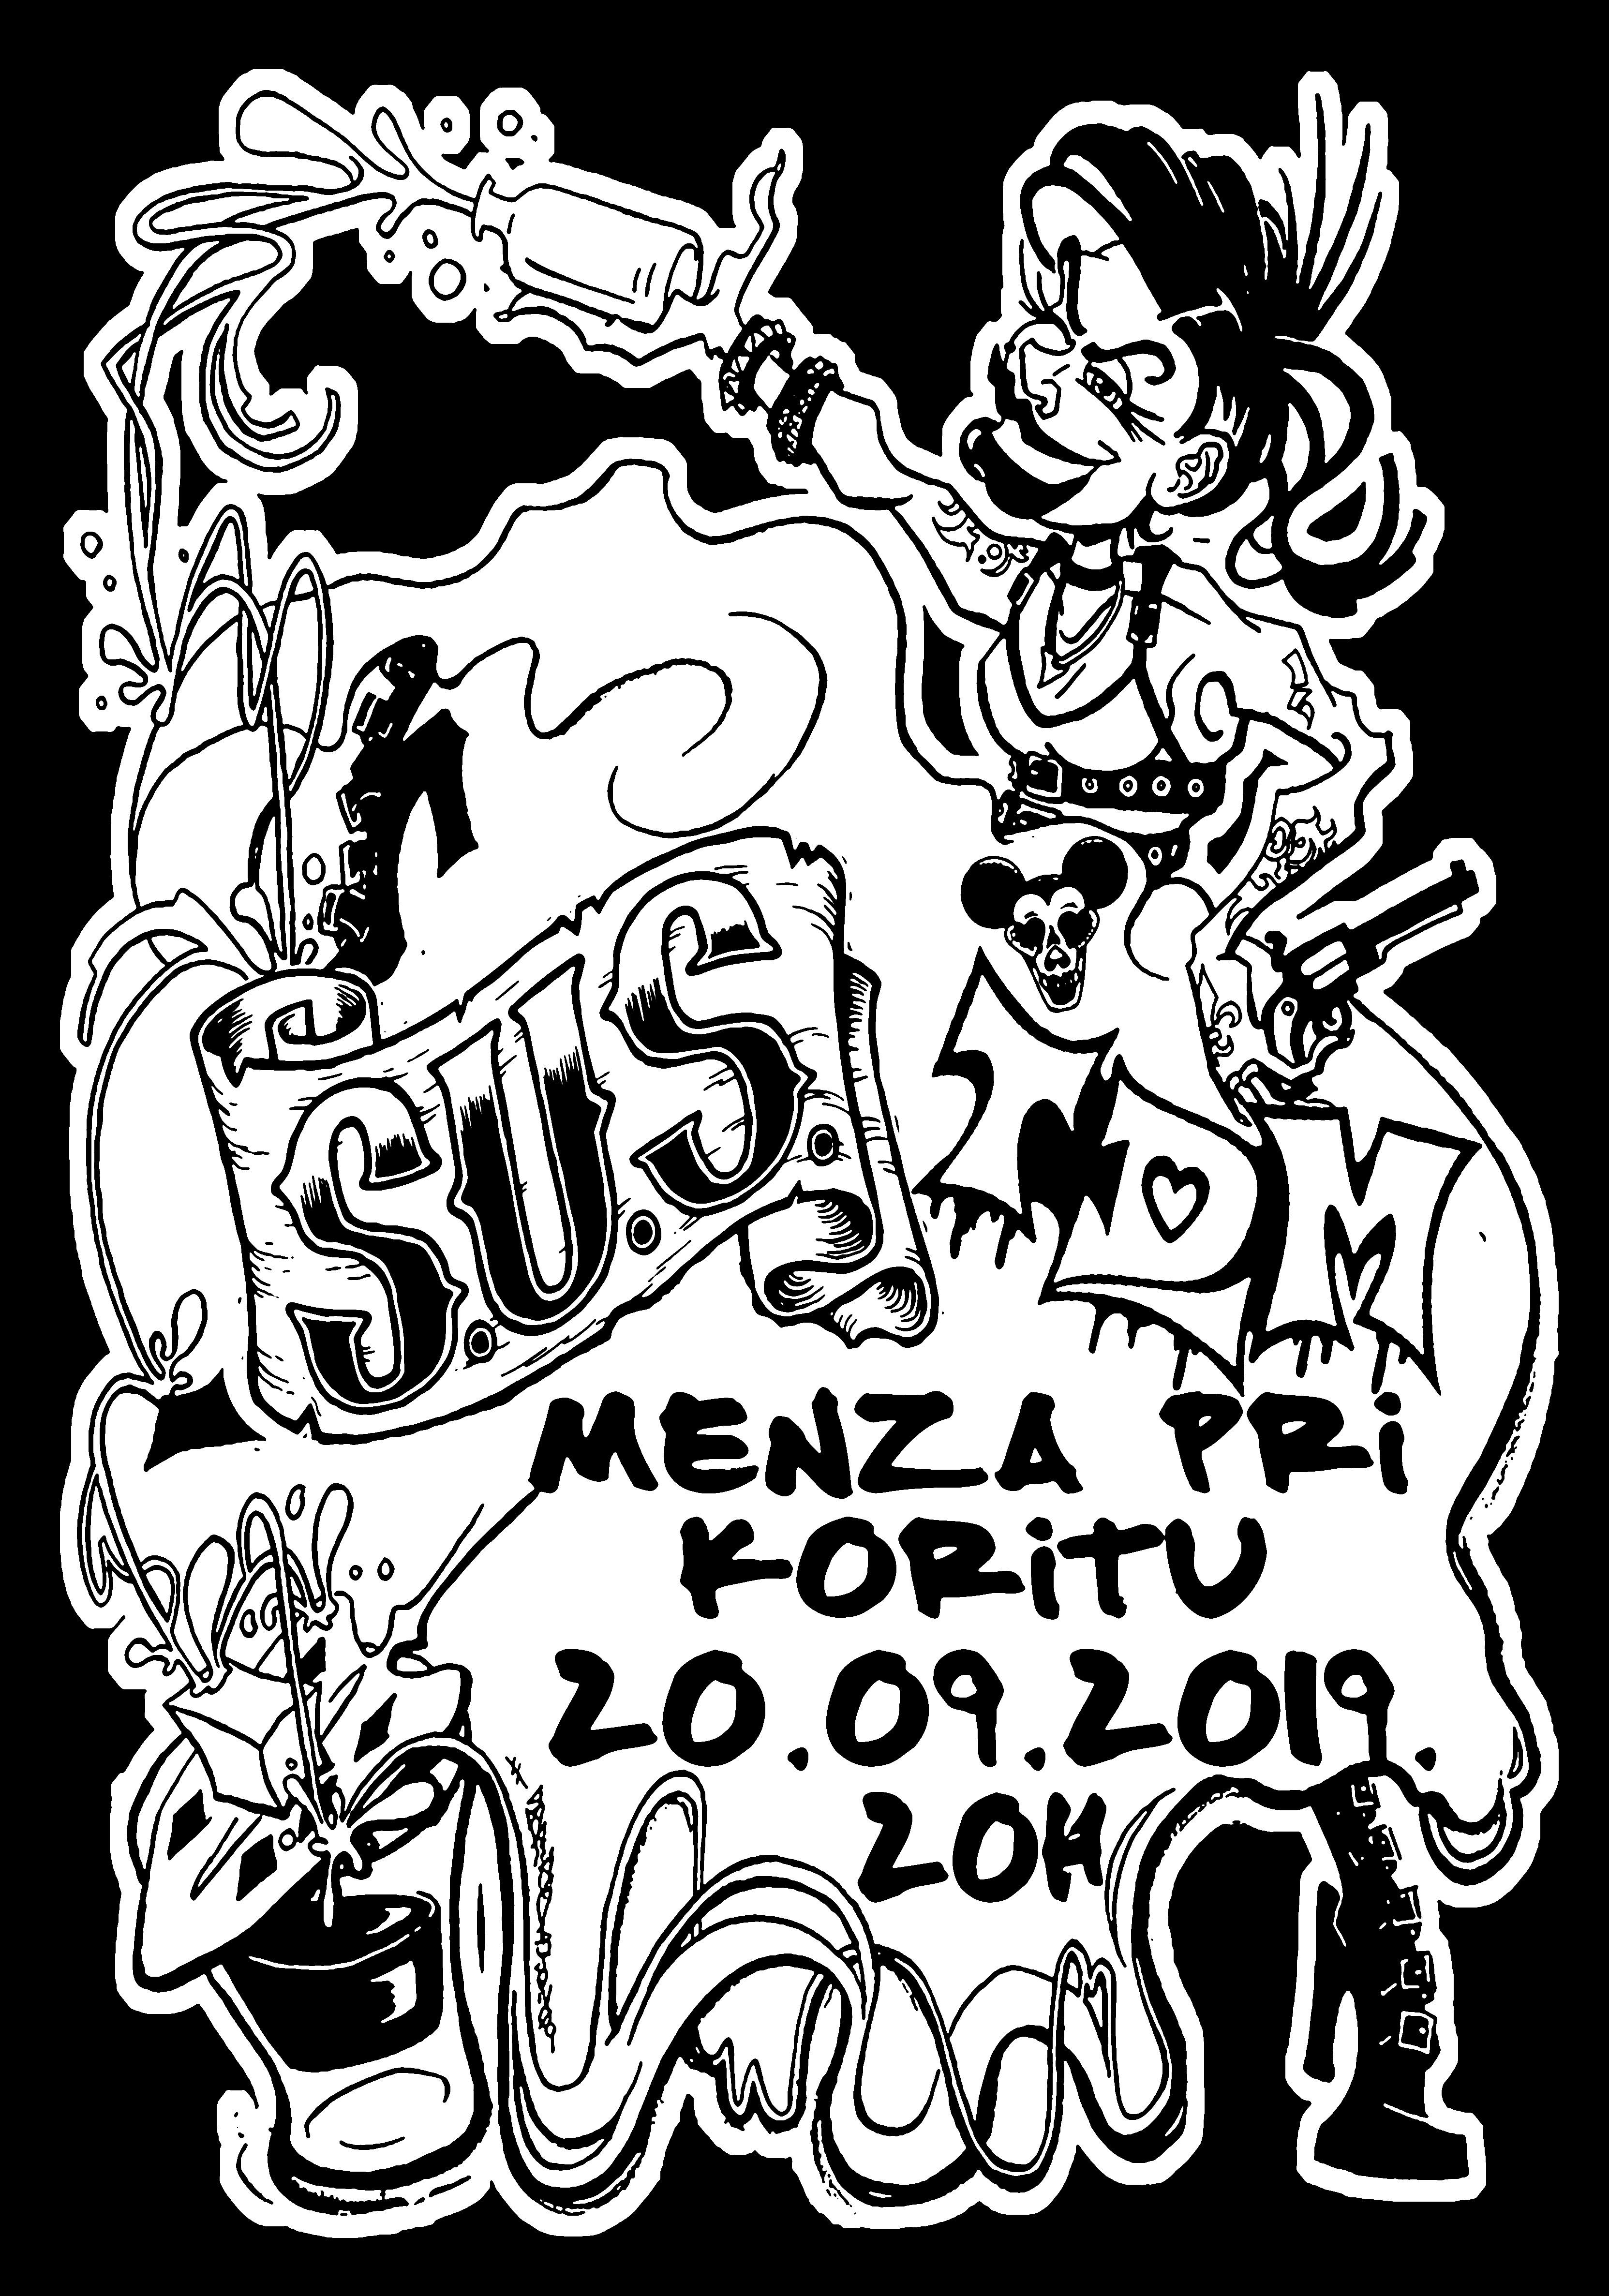 Beograjski SUS + T.D.M = punk&roll simpaticos